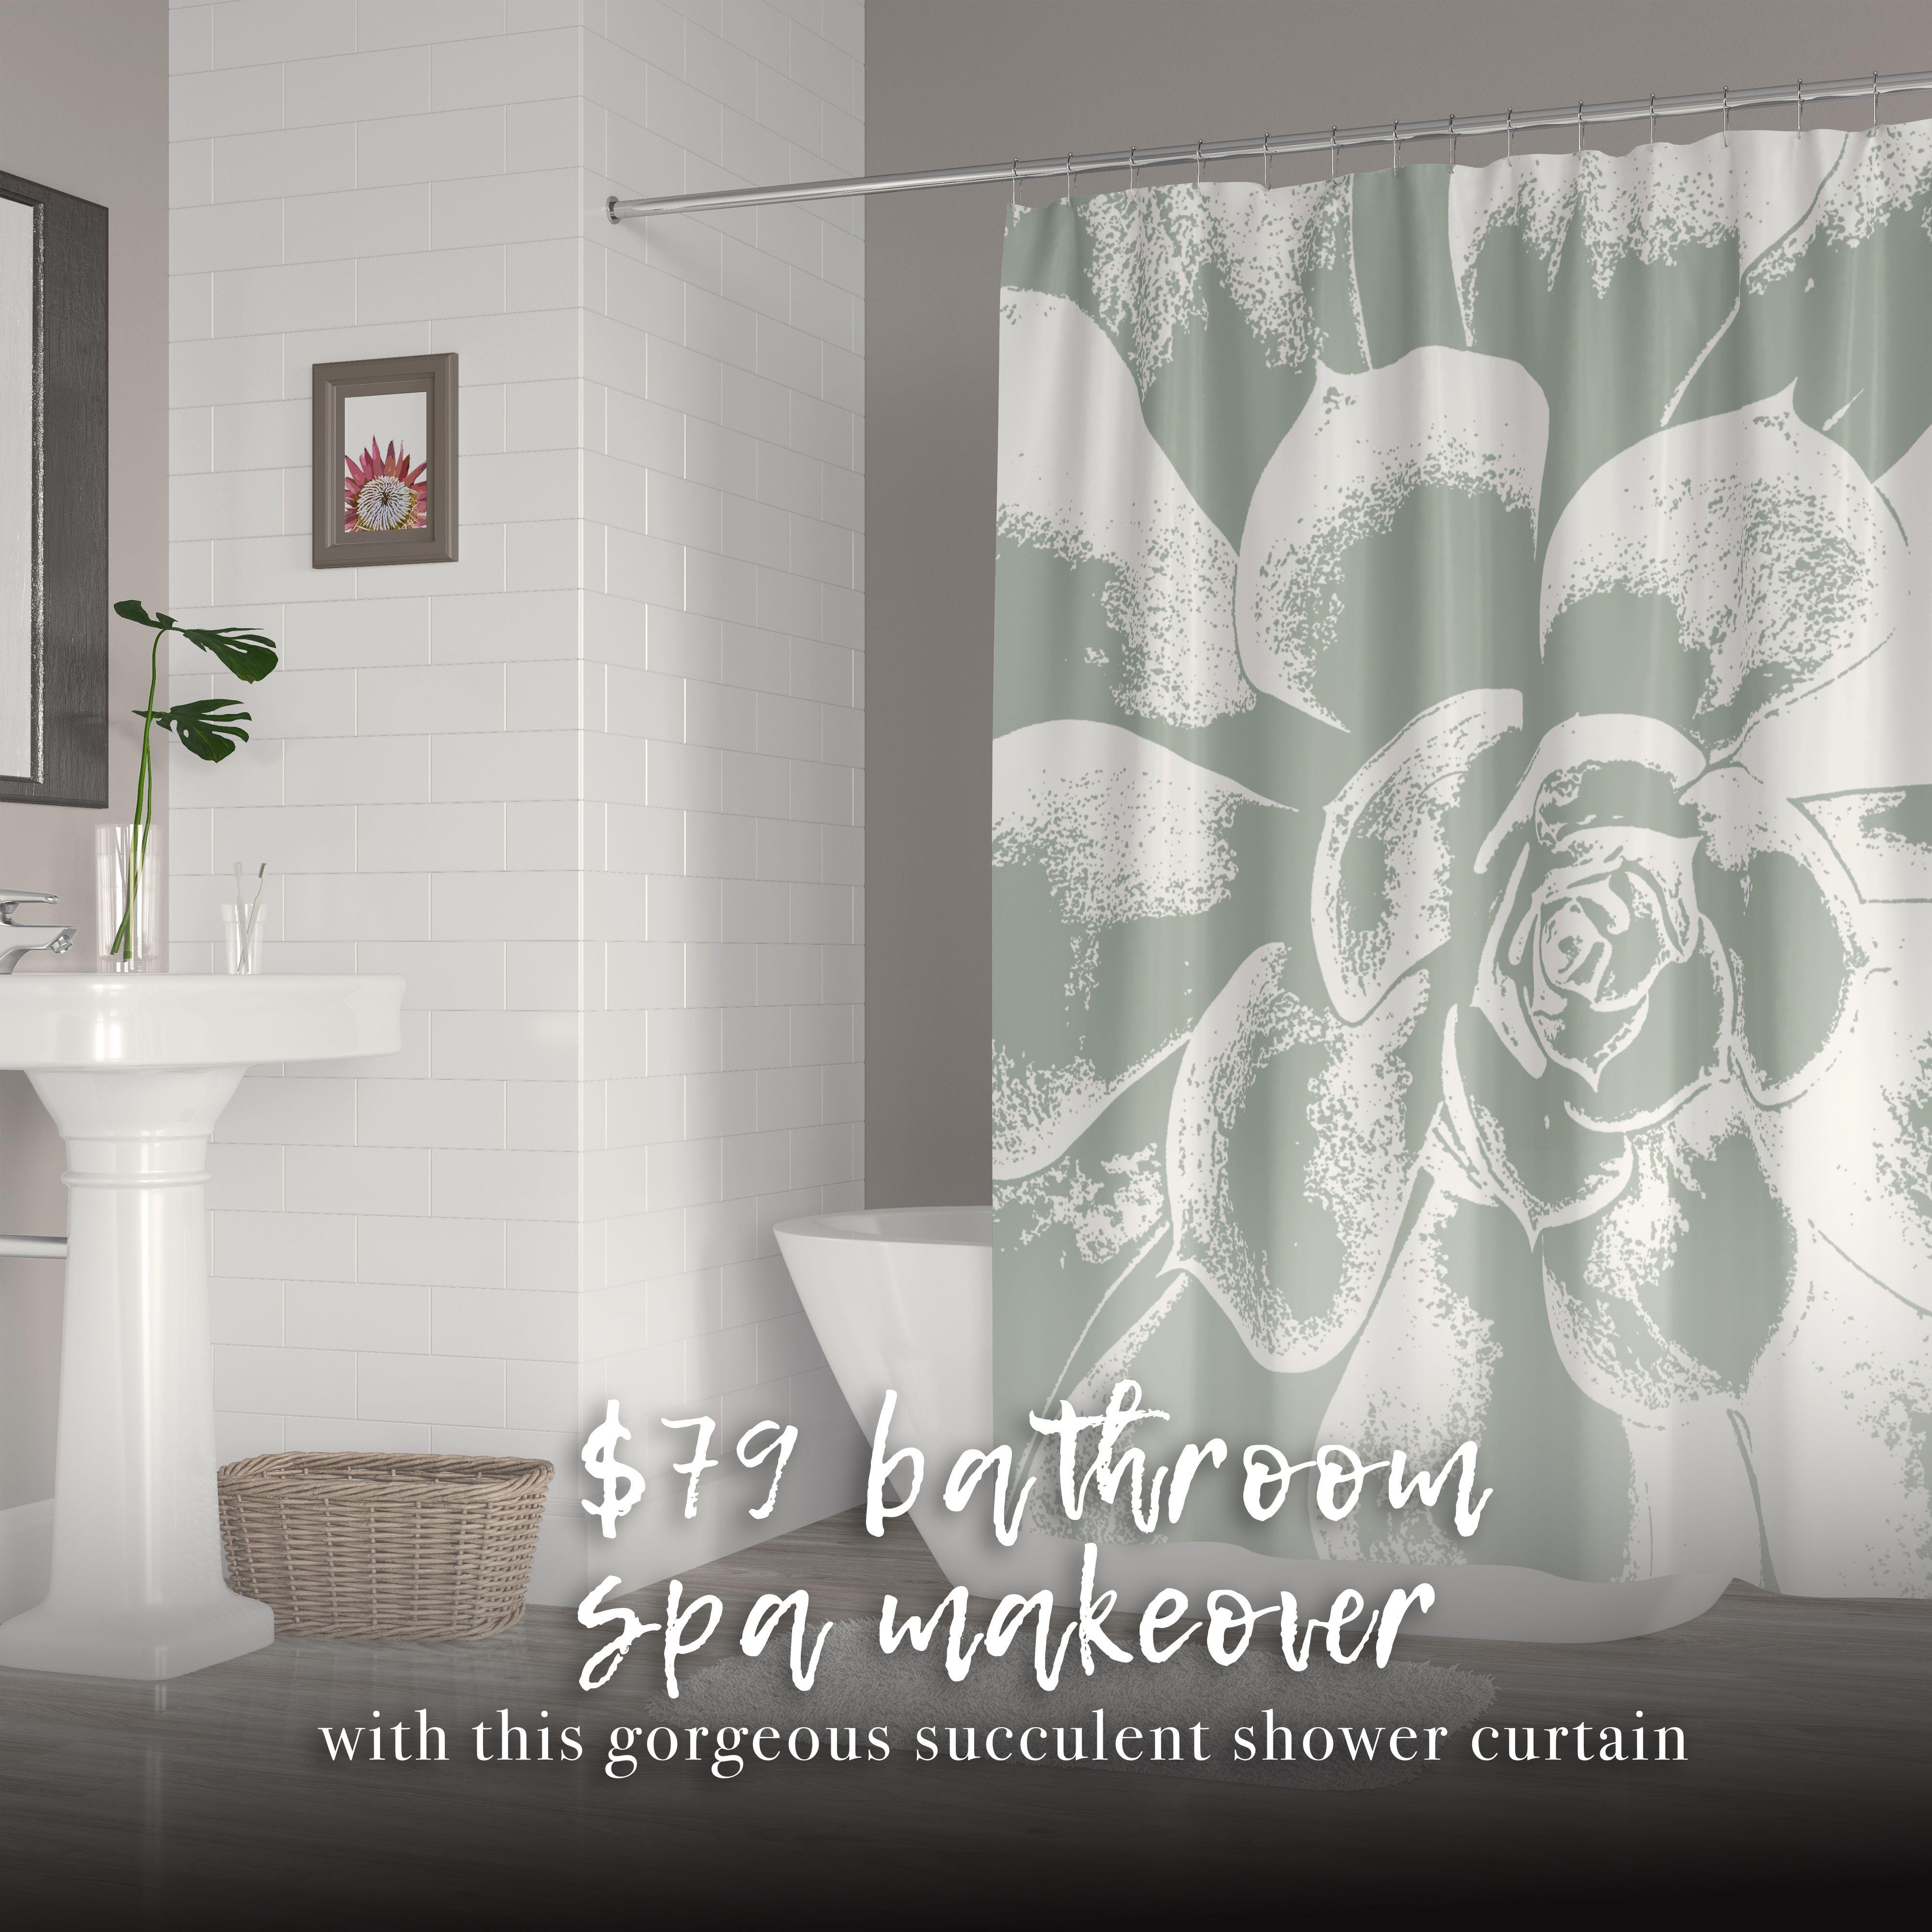 Large Green And White Succulent Shower Curtain Dream Bathrooms Luxury Bathroom Bathroom Interior Design